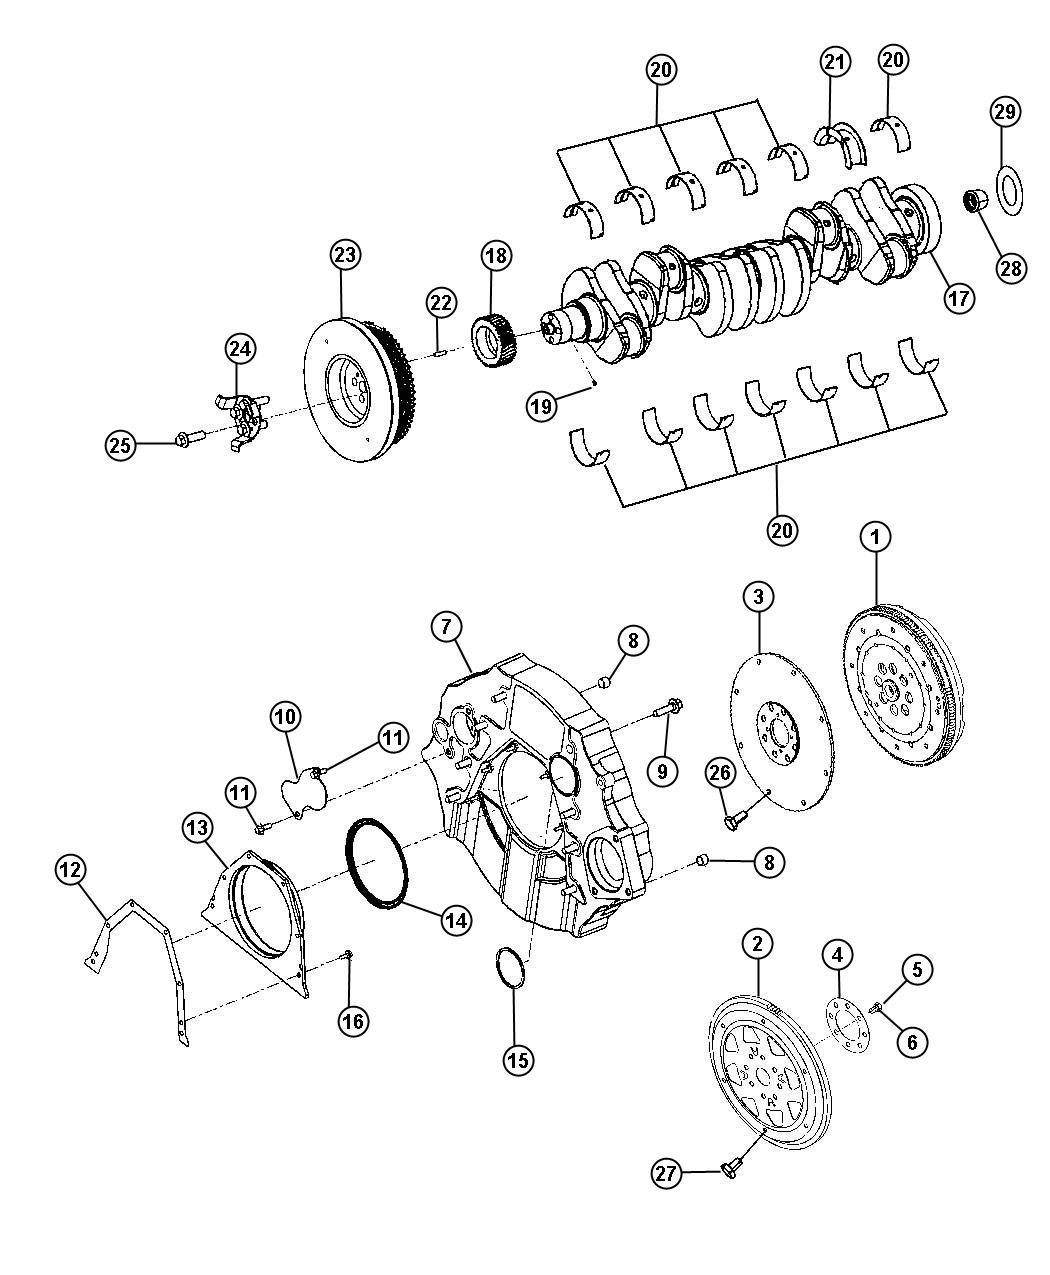 2012 Dodge Ram 2500 Dowel pin, pin. Crankshaft gear